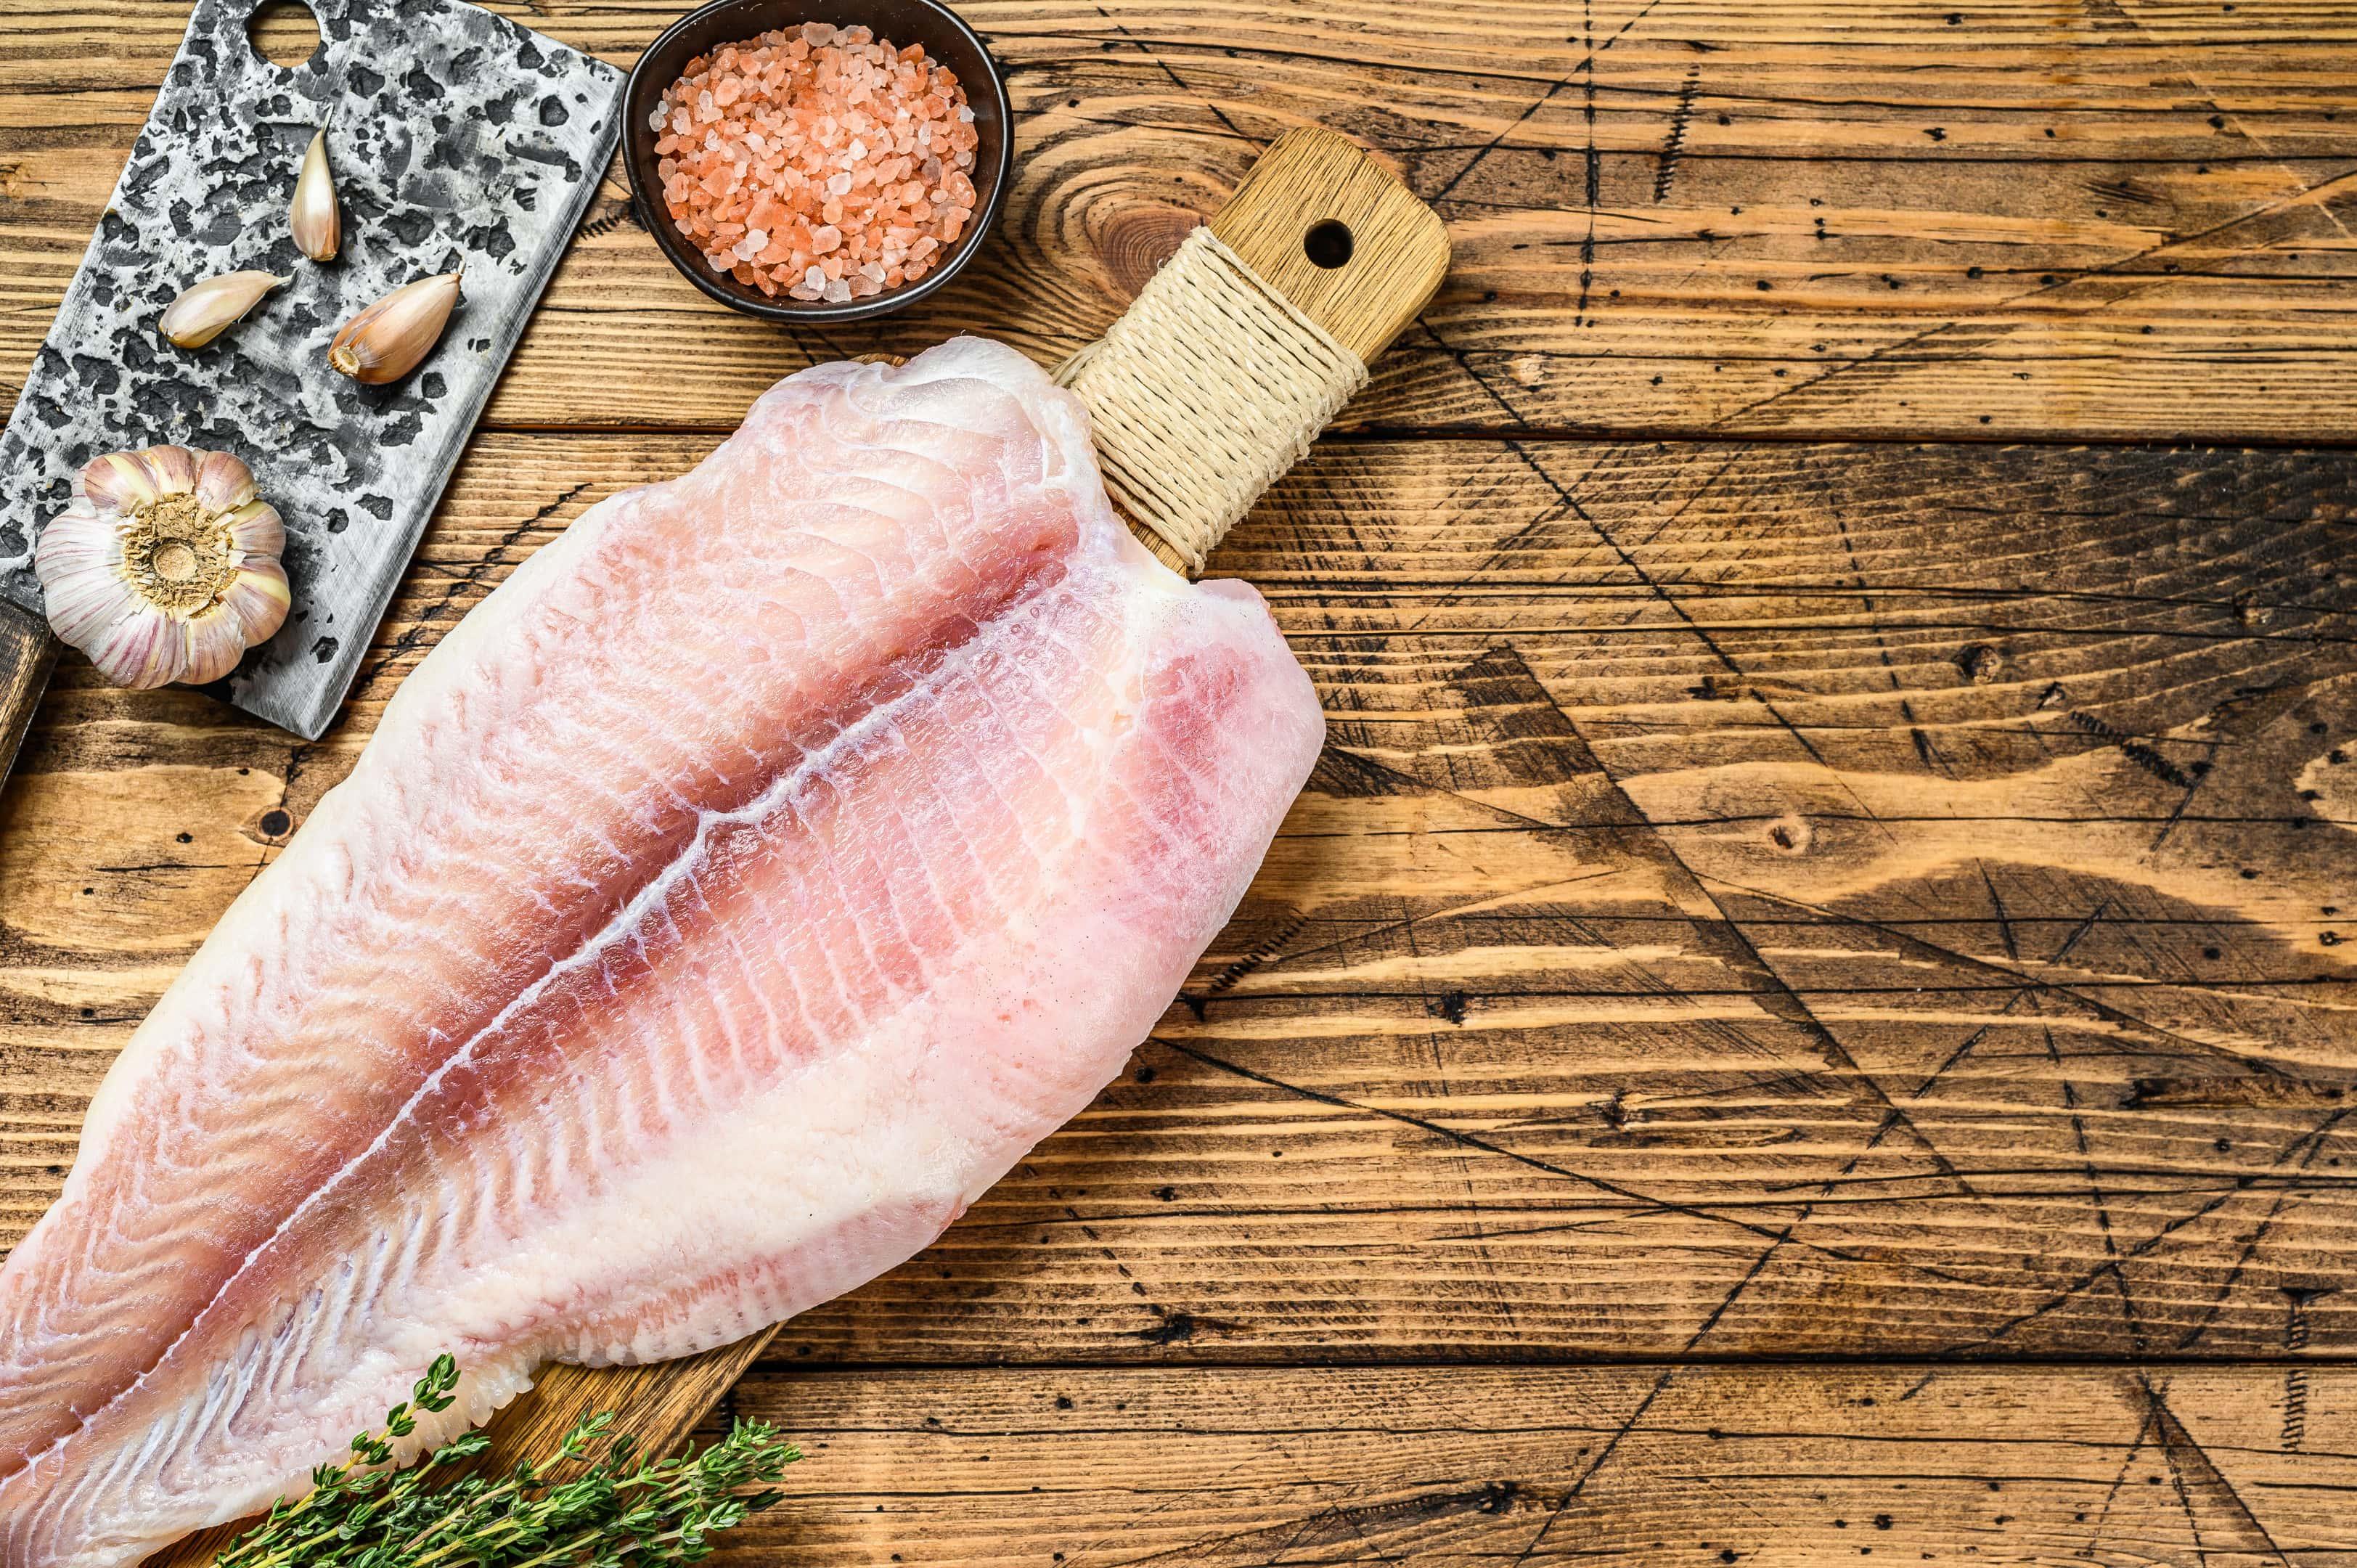 Raw Fillet of Cod Fish on Cutting Board